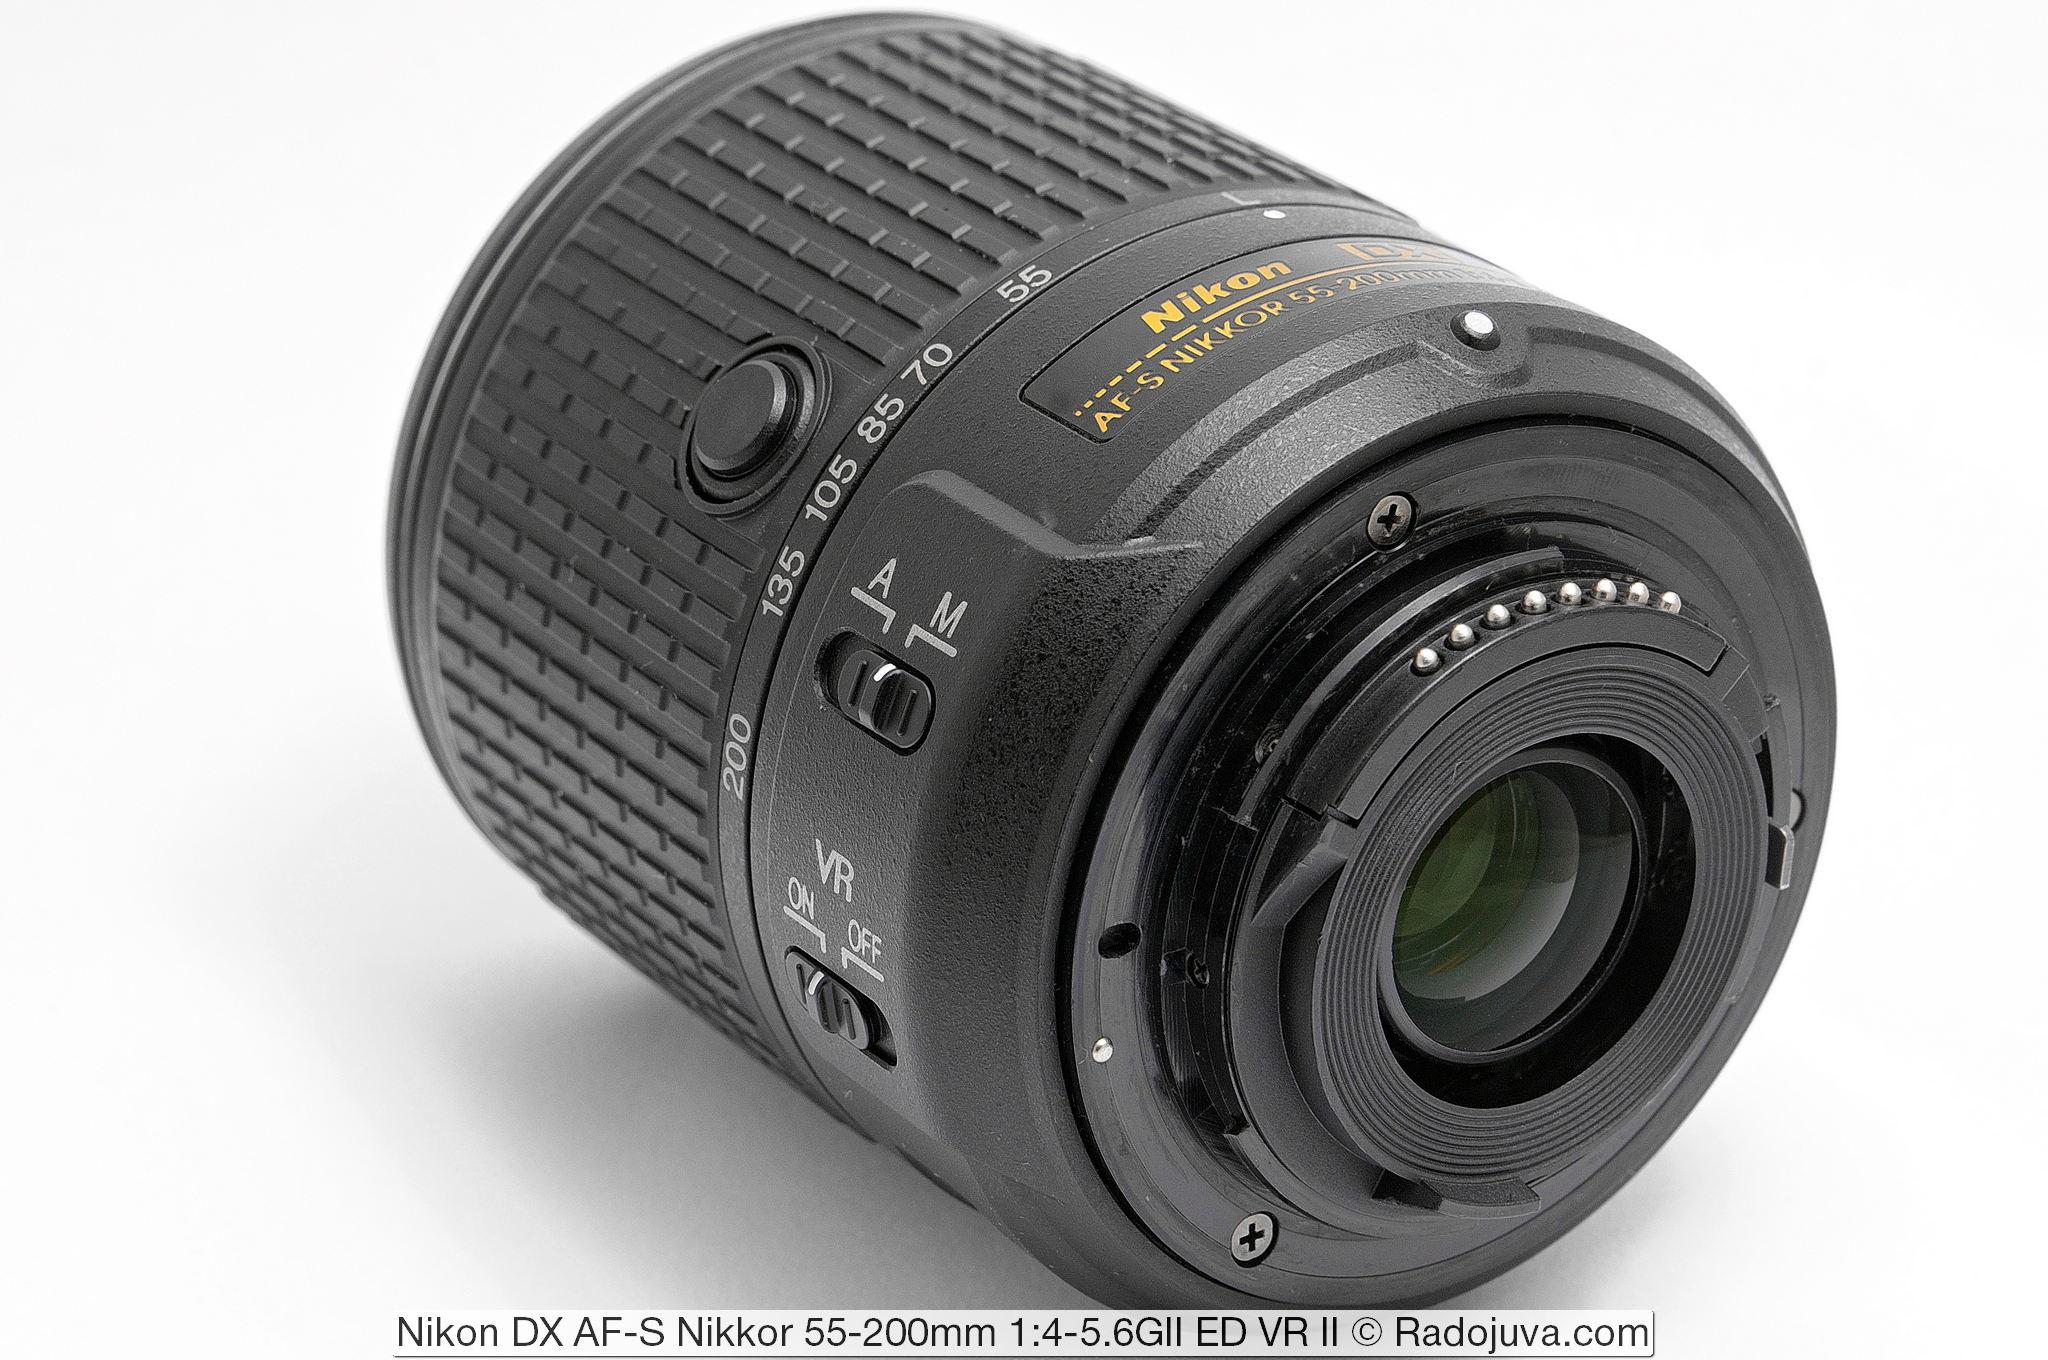 Nikon 55-200/4-5.6GII VRII